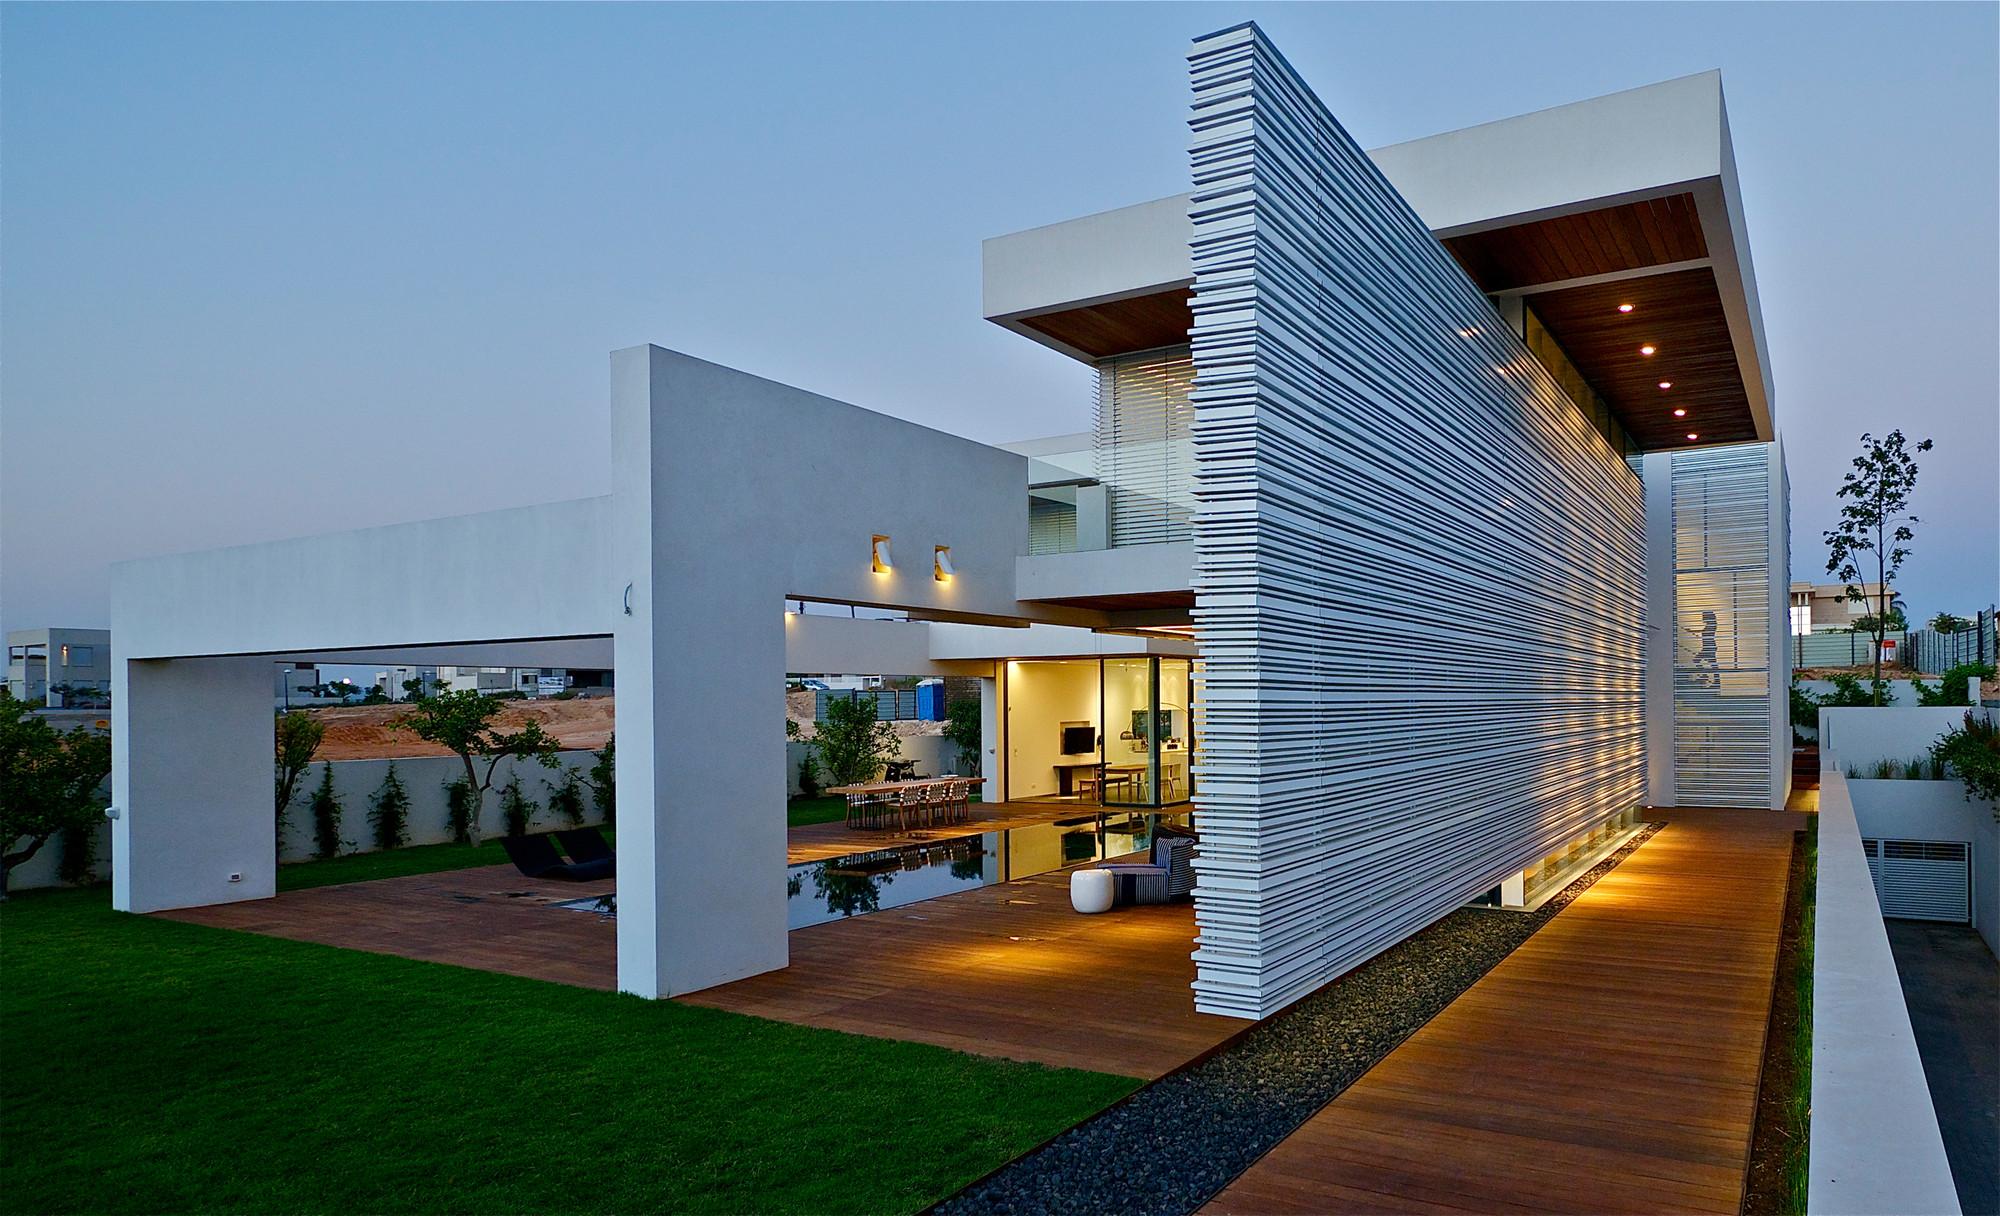 Villa C / Gal Marom Architects, © Itay Sikolsky